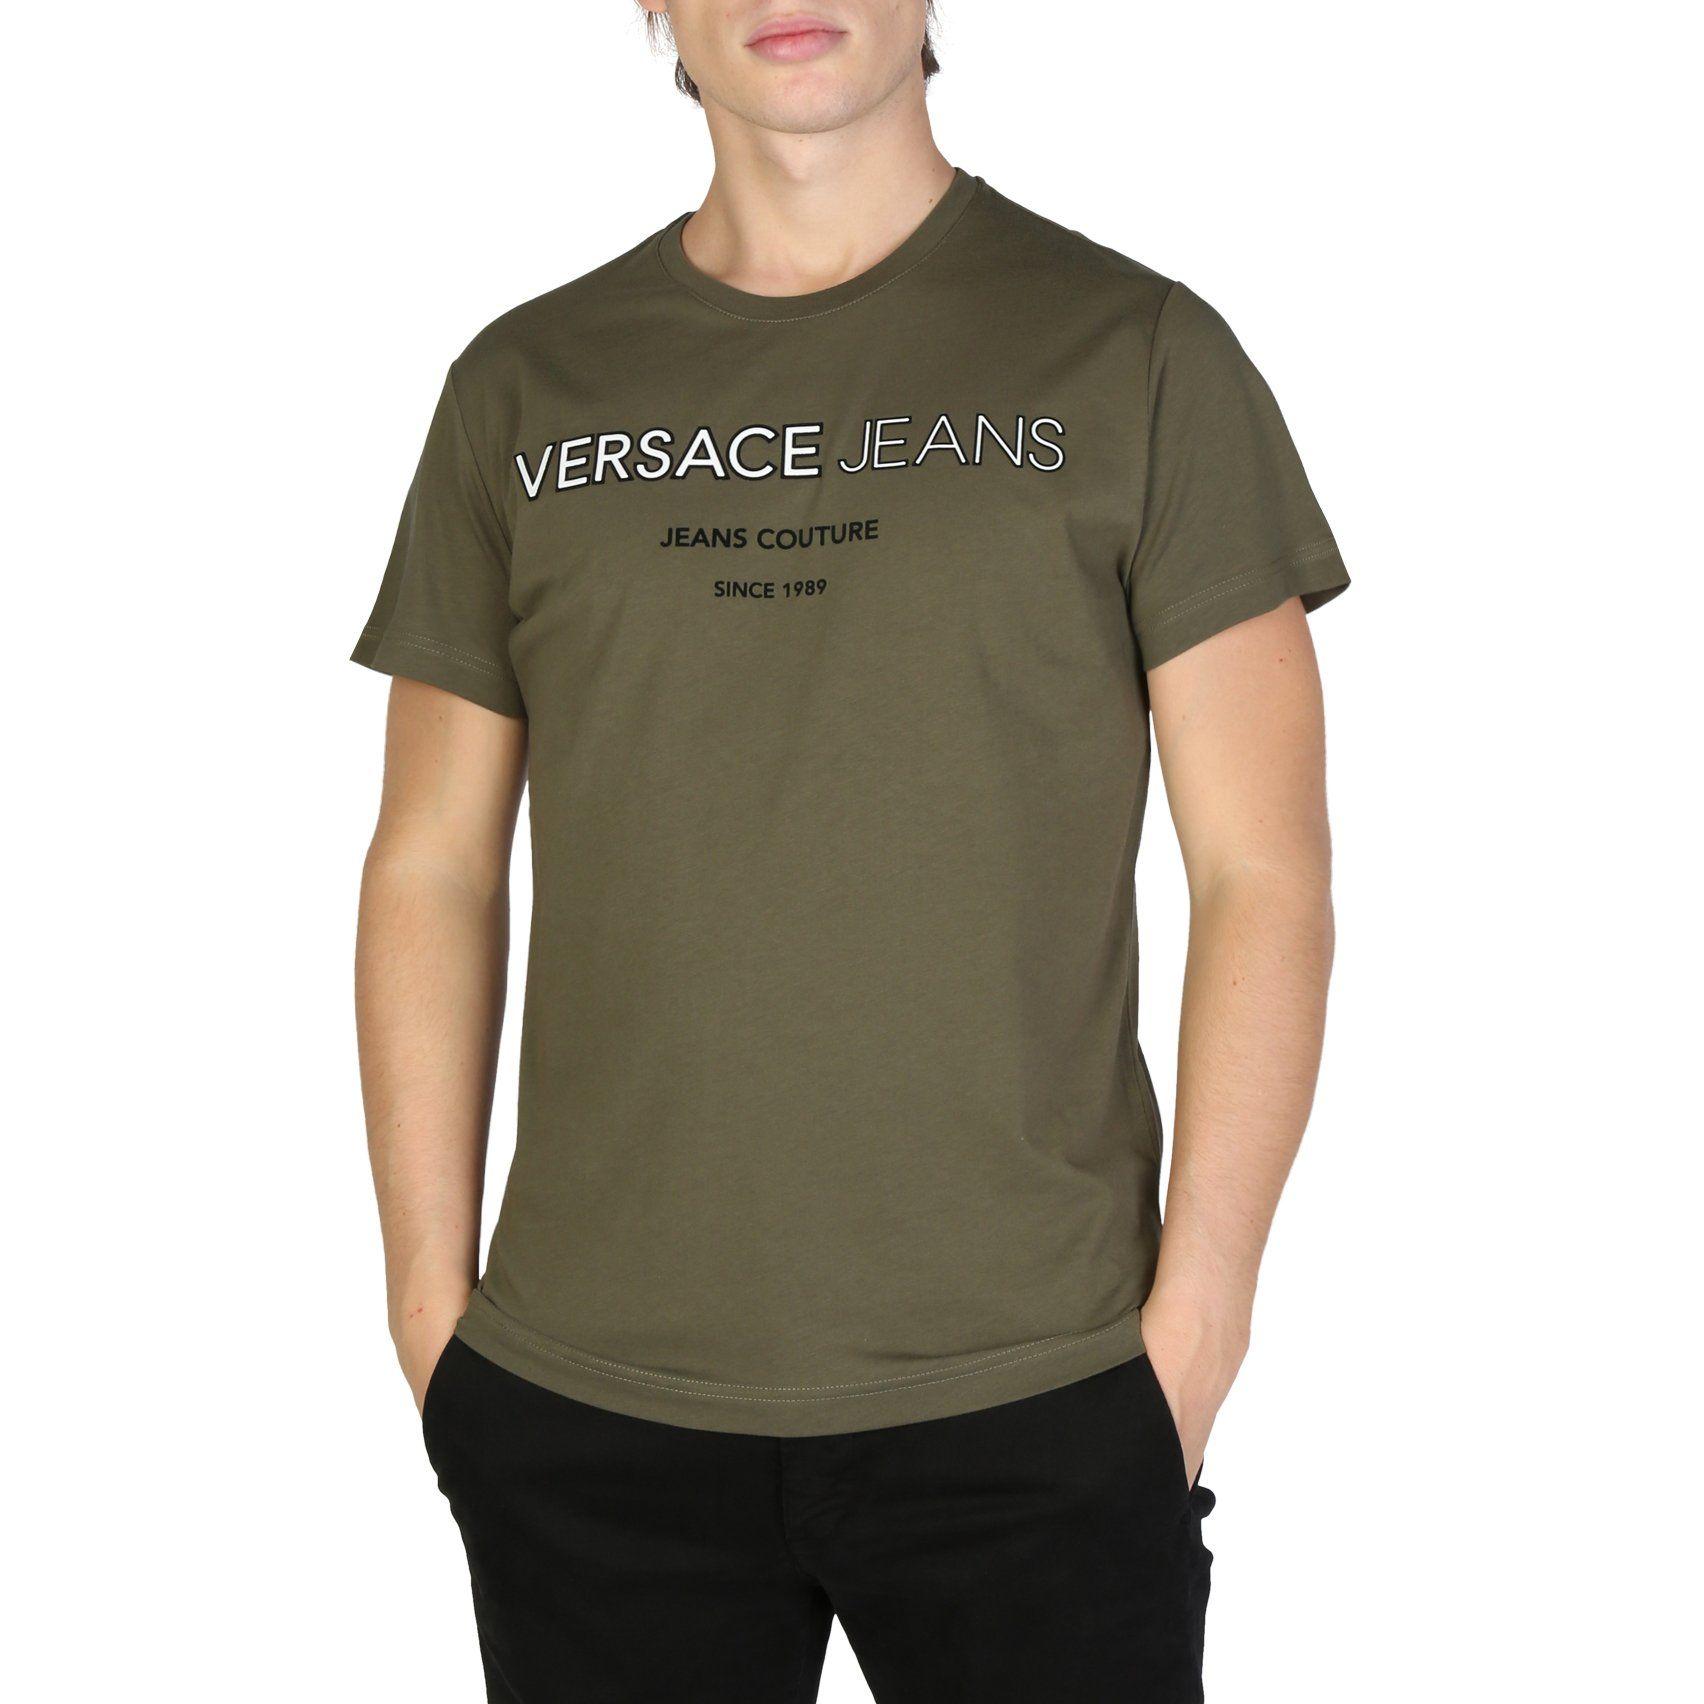 Versace Jeans Green Tee Black White Print B3gsb71c 36609 Free Ship Versace Jeans Versace Shirts Versace T Shirt